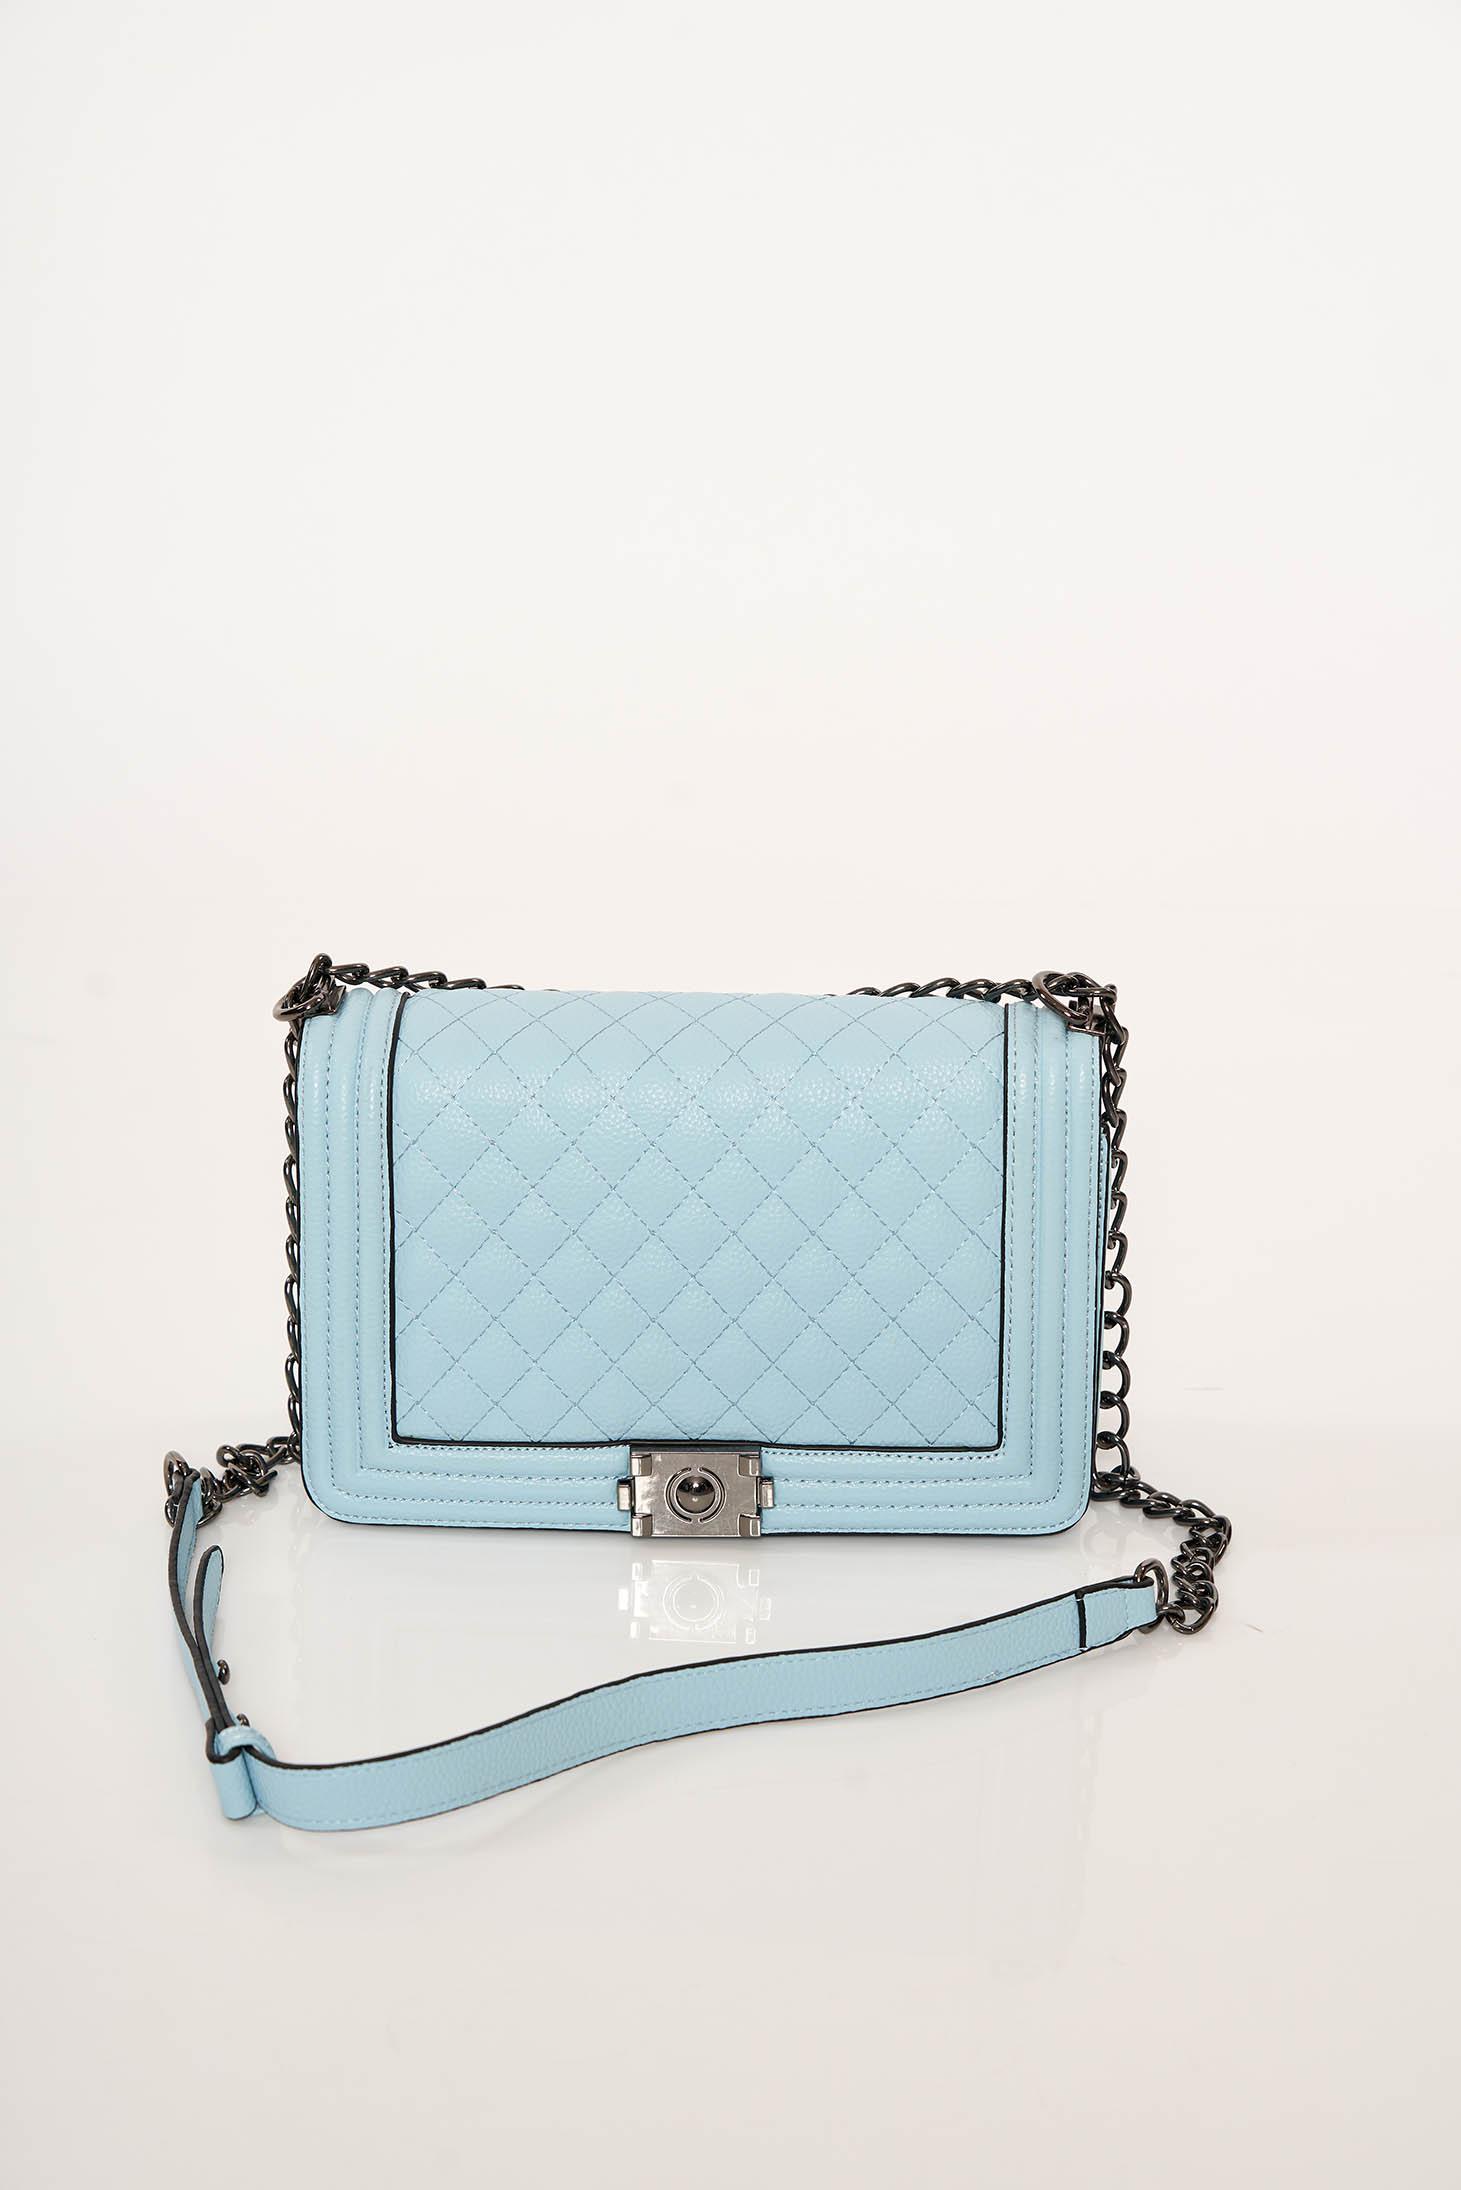 Geanta dama albastra-deschis eleganta din piele ecologica accesorizata cu o catarama metalica